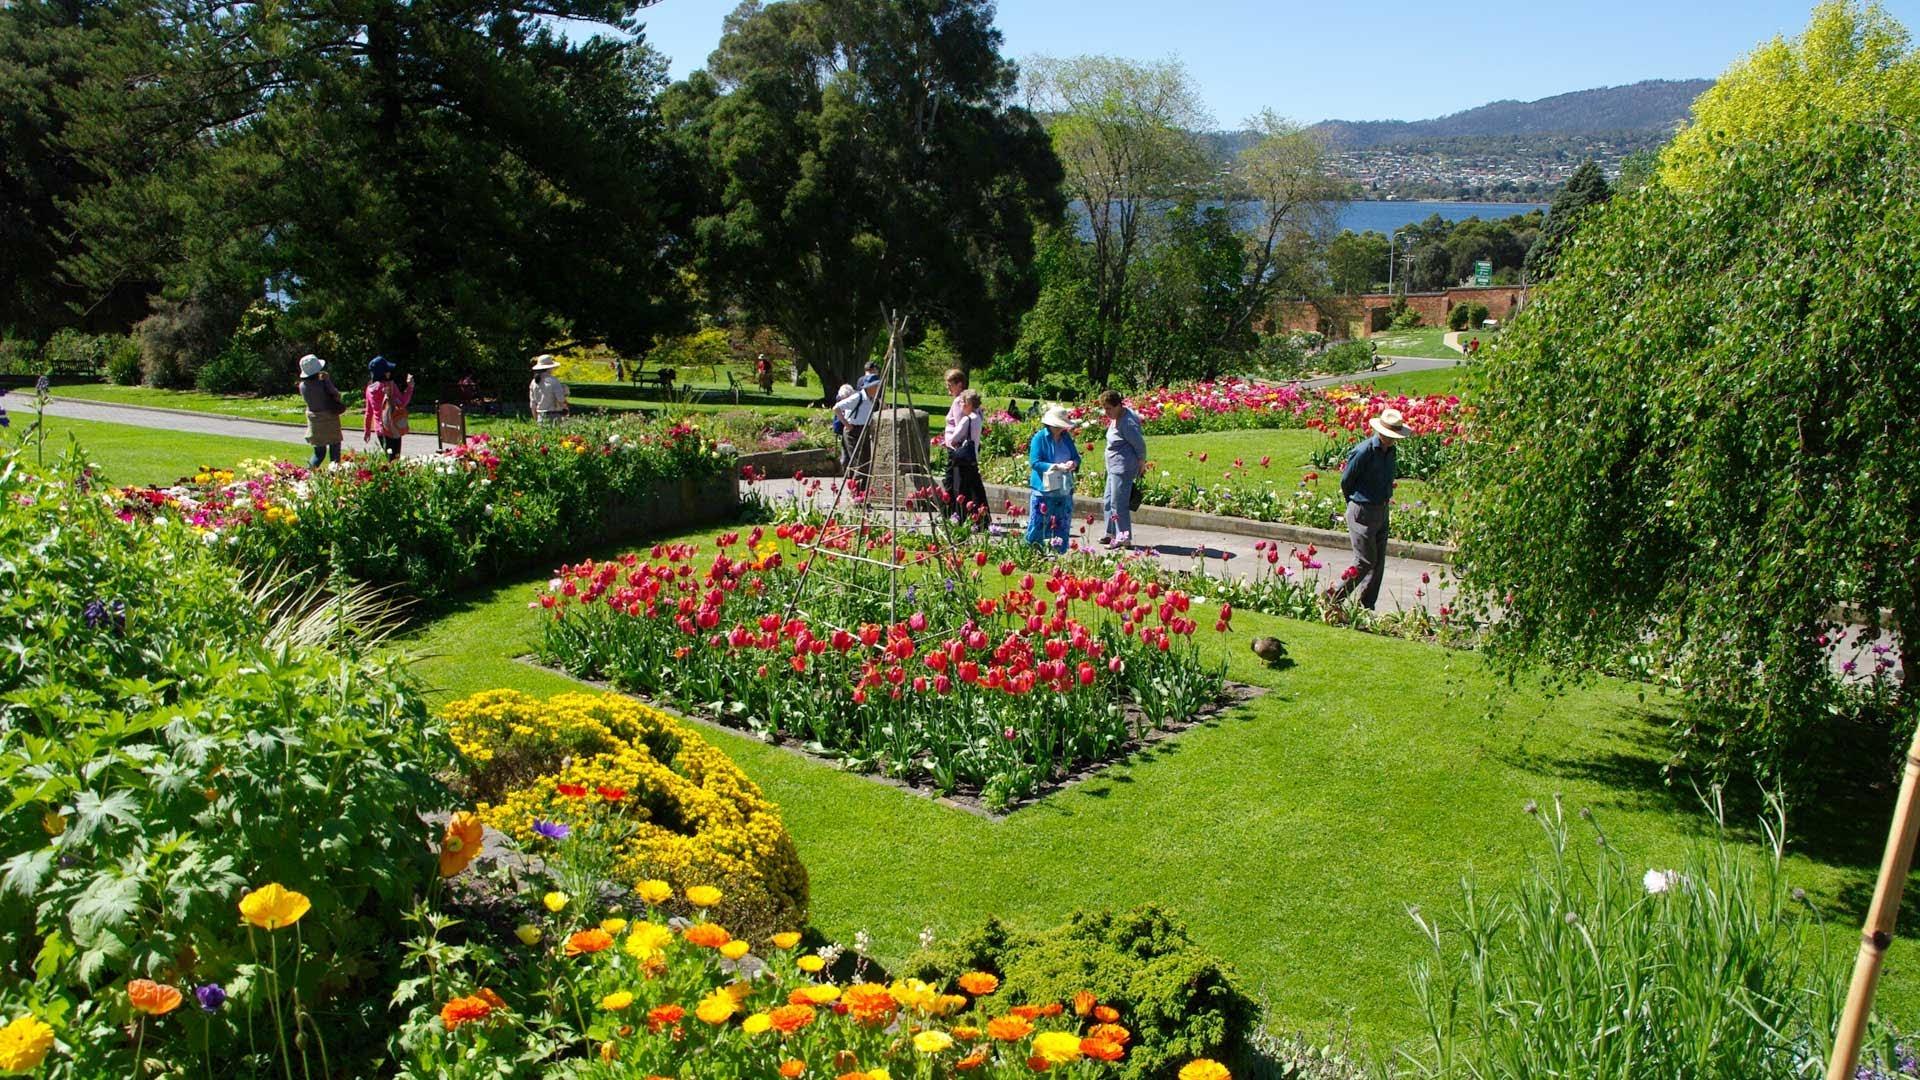 Visit the Royal Tasmania National Botanical Gardens